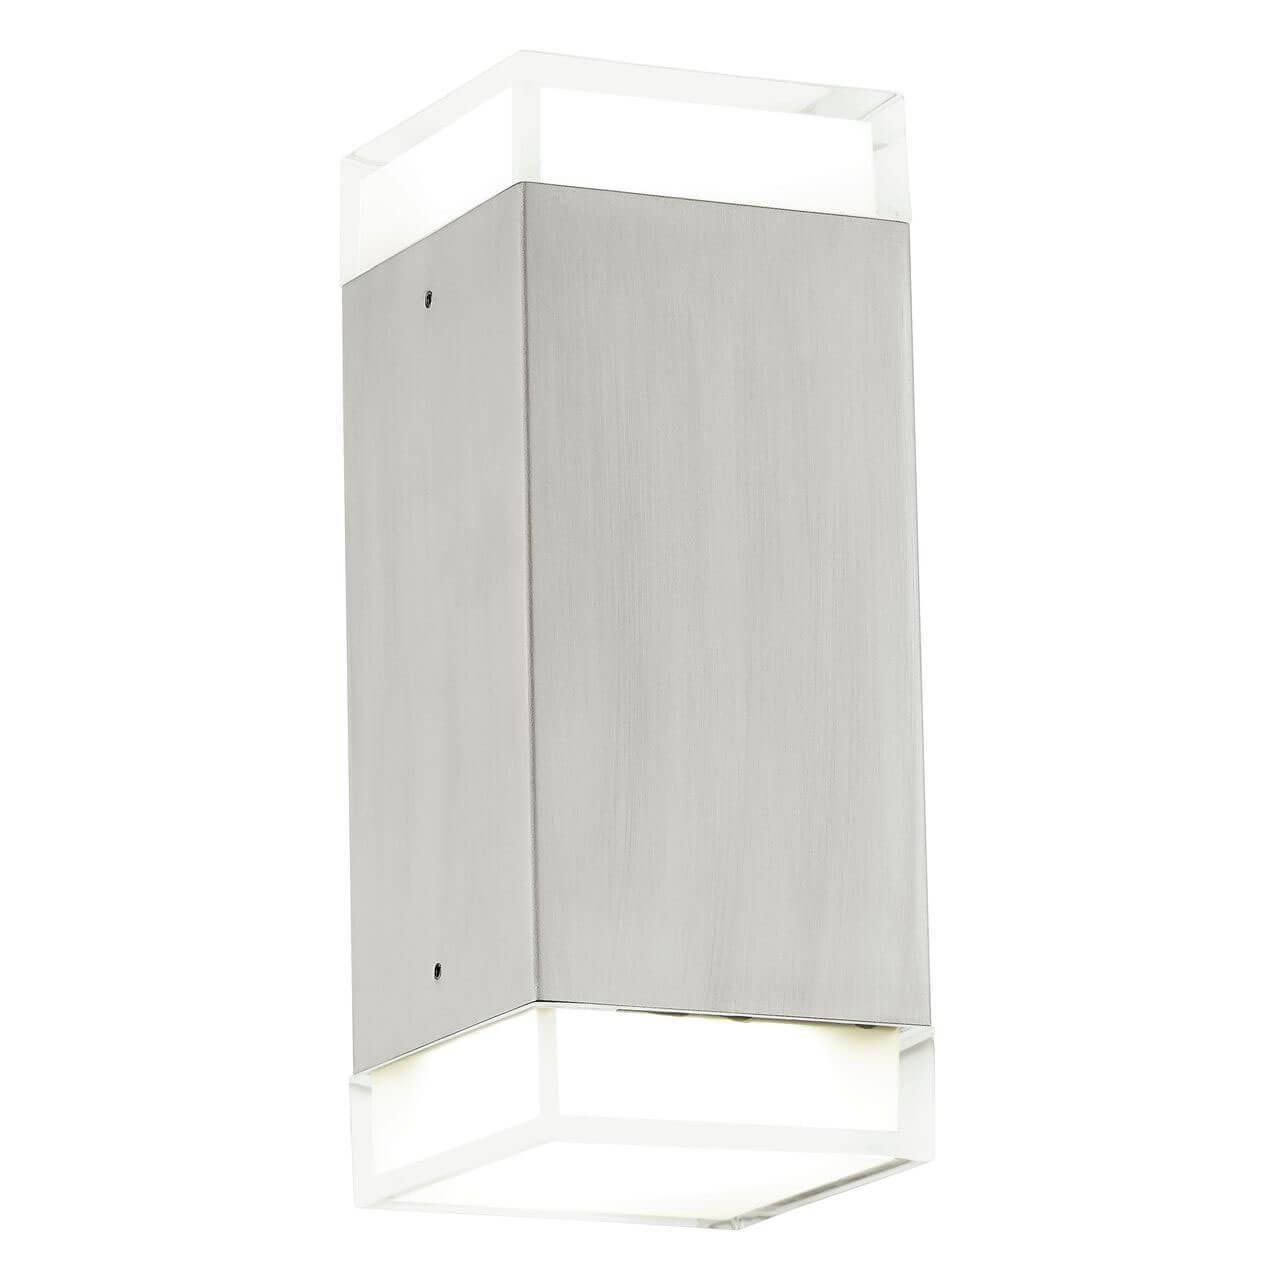 Уличный светильник Eglo 93364, LED цены